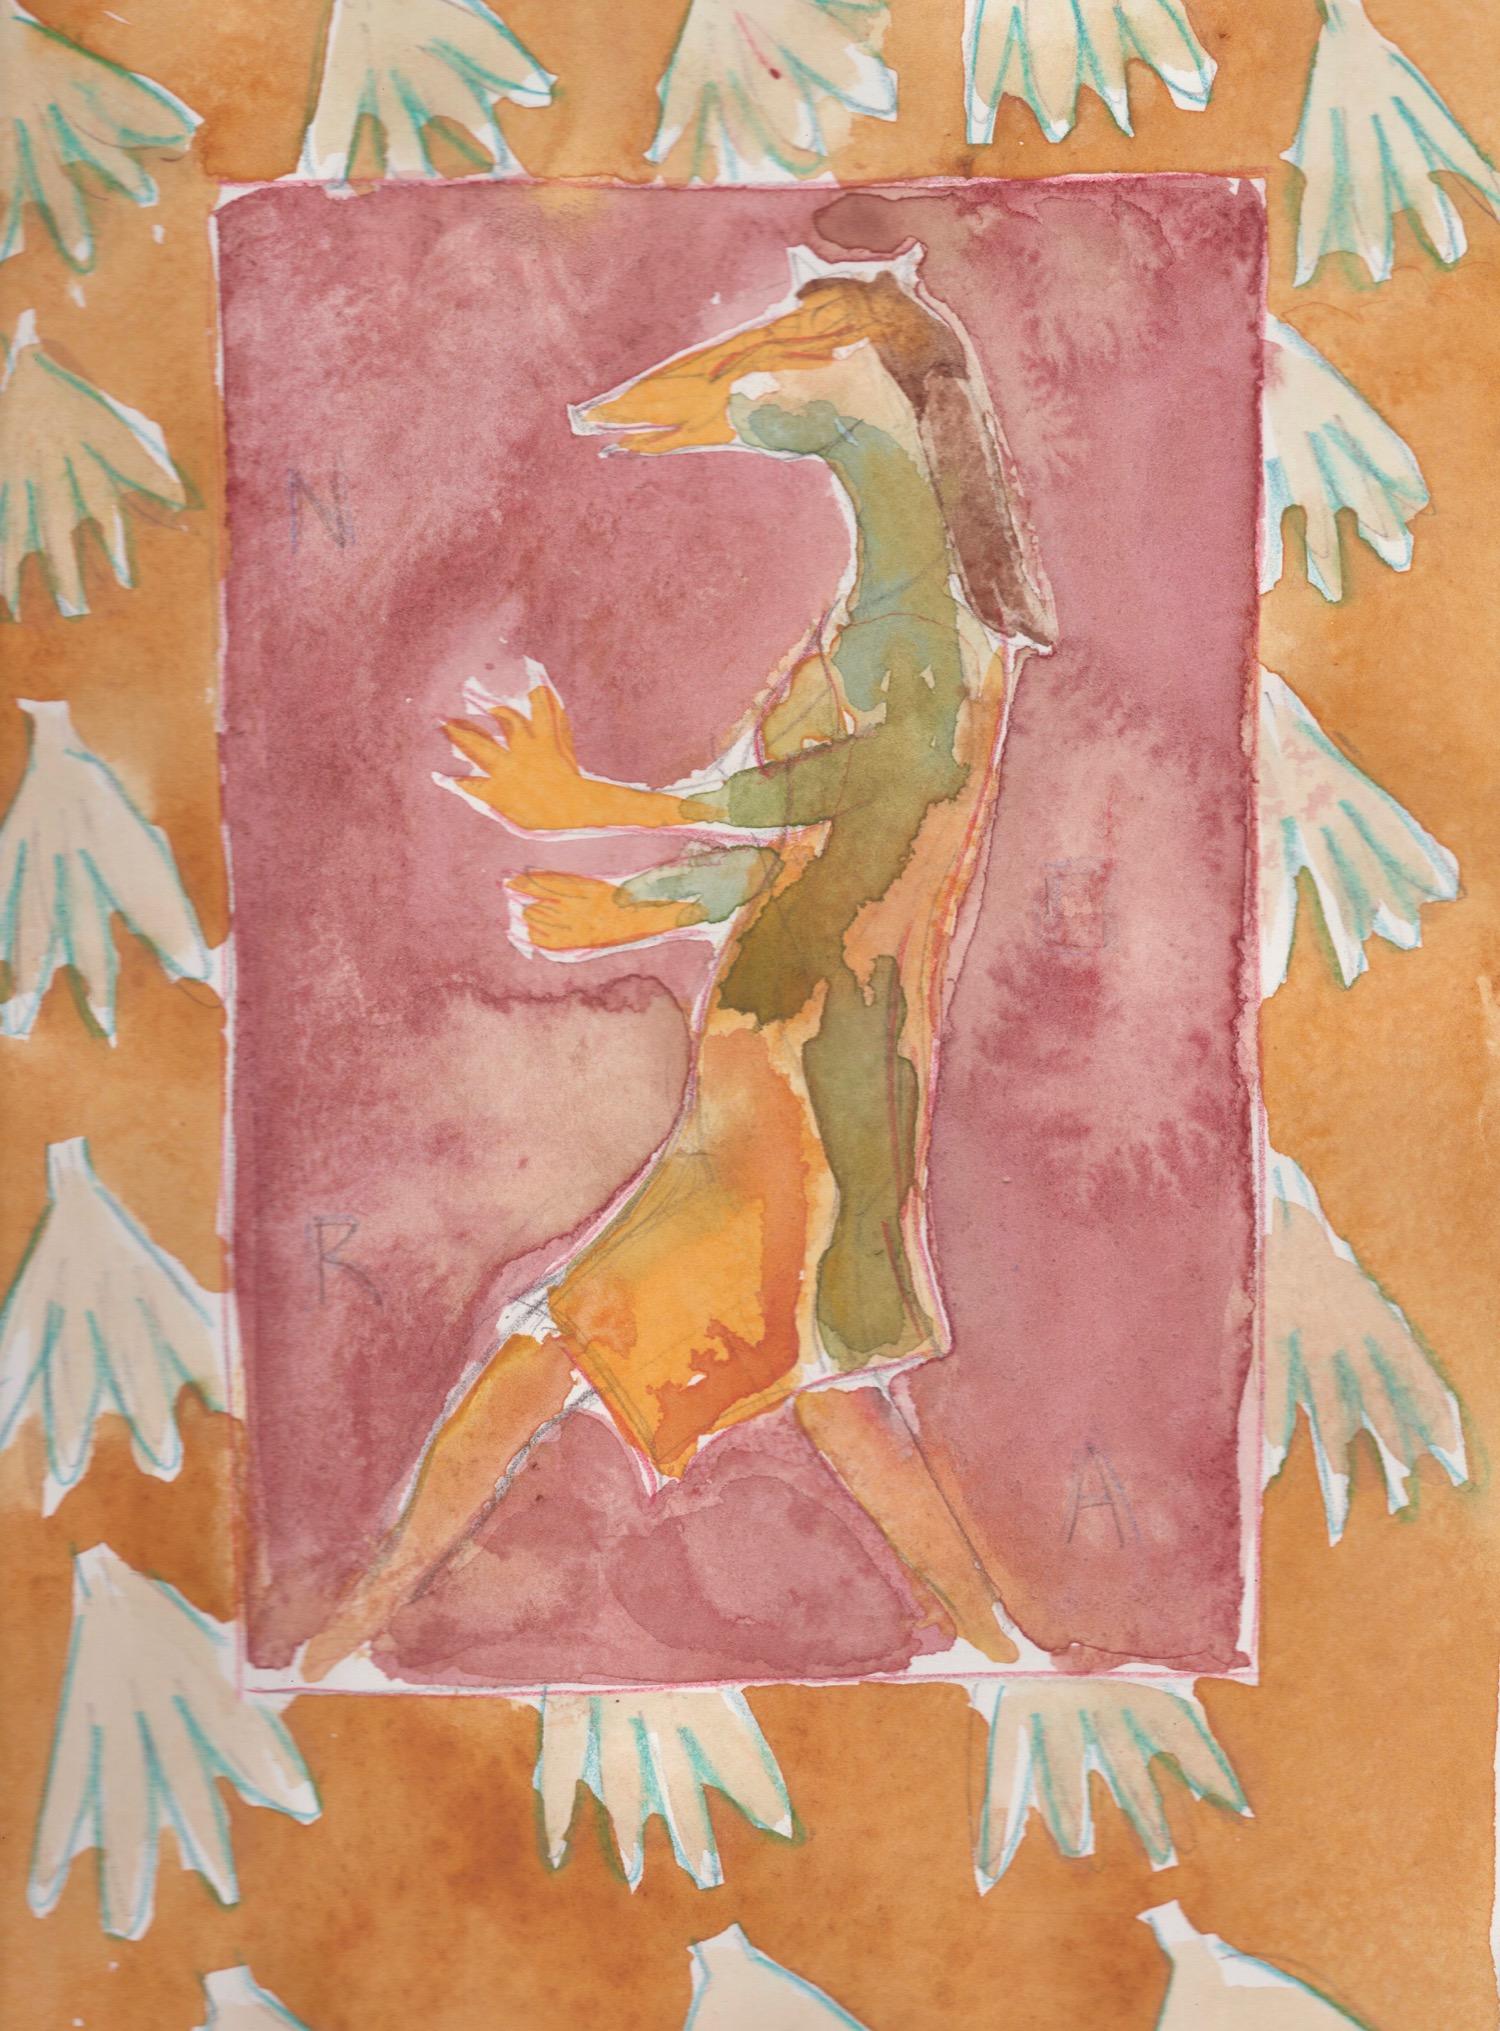 """Nora (Fox),"" Colored pencil, graphite and watercolor on paper, 14 x 11 inches."